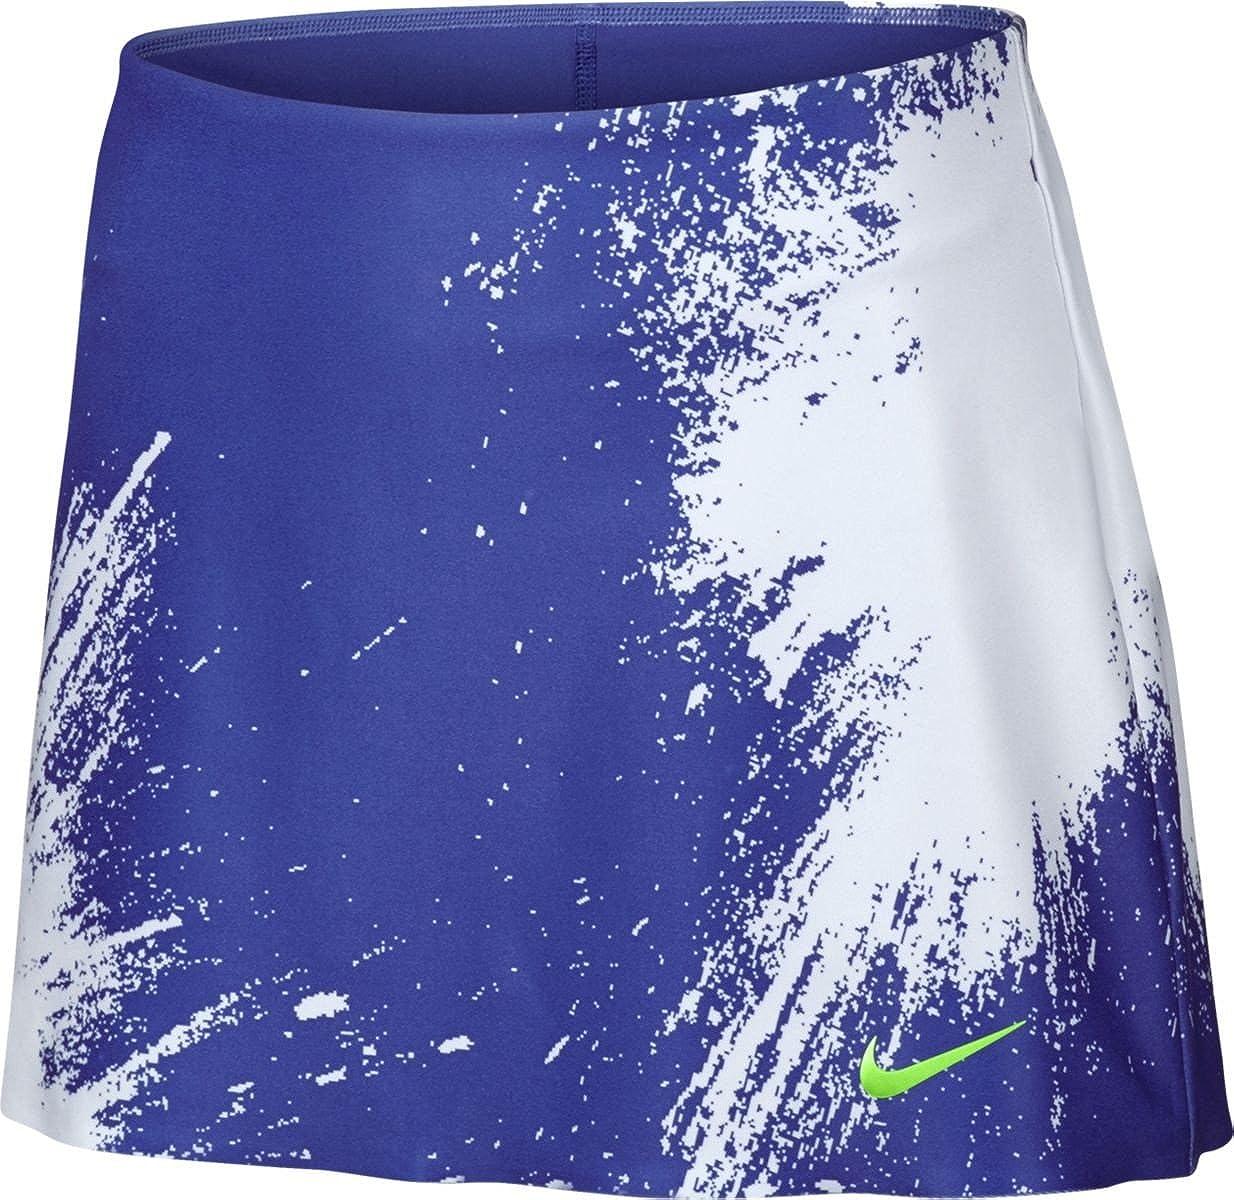 Desconocido Nike Court Power Spin - Falda de Tenis para Mujer ...